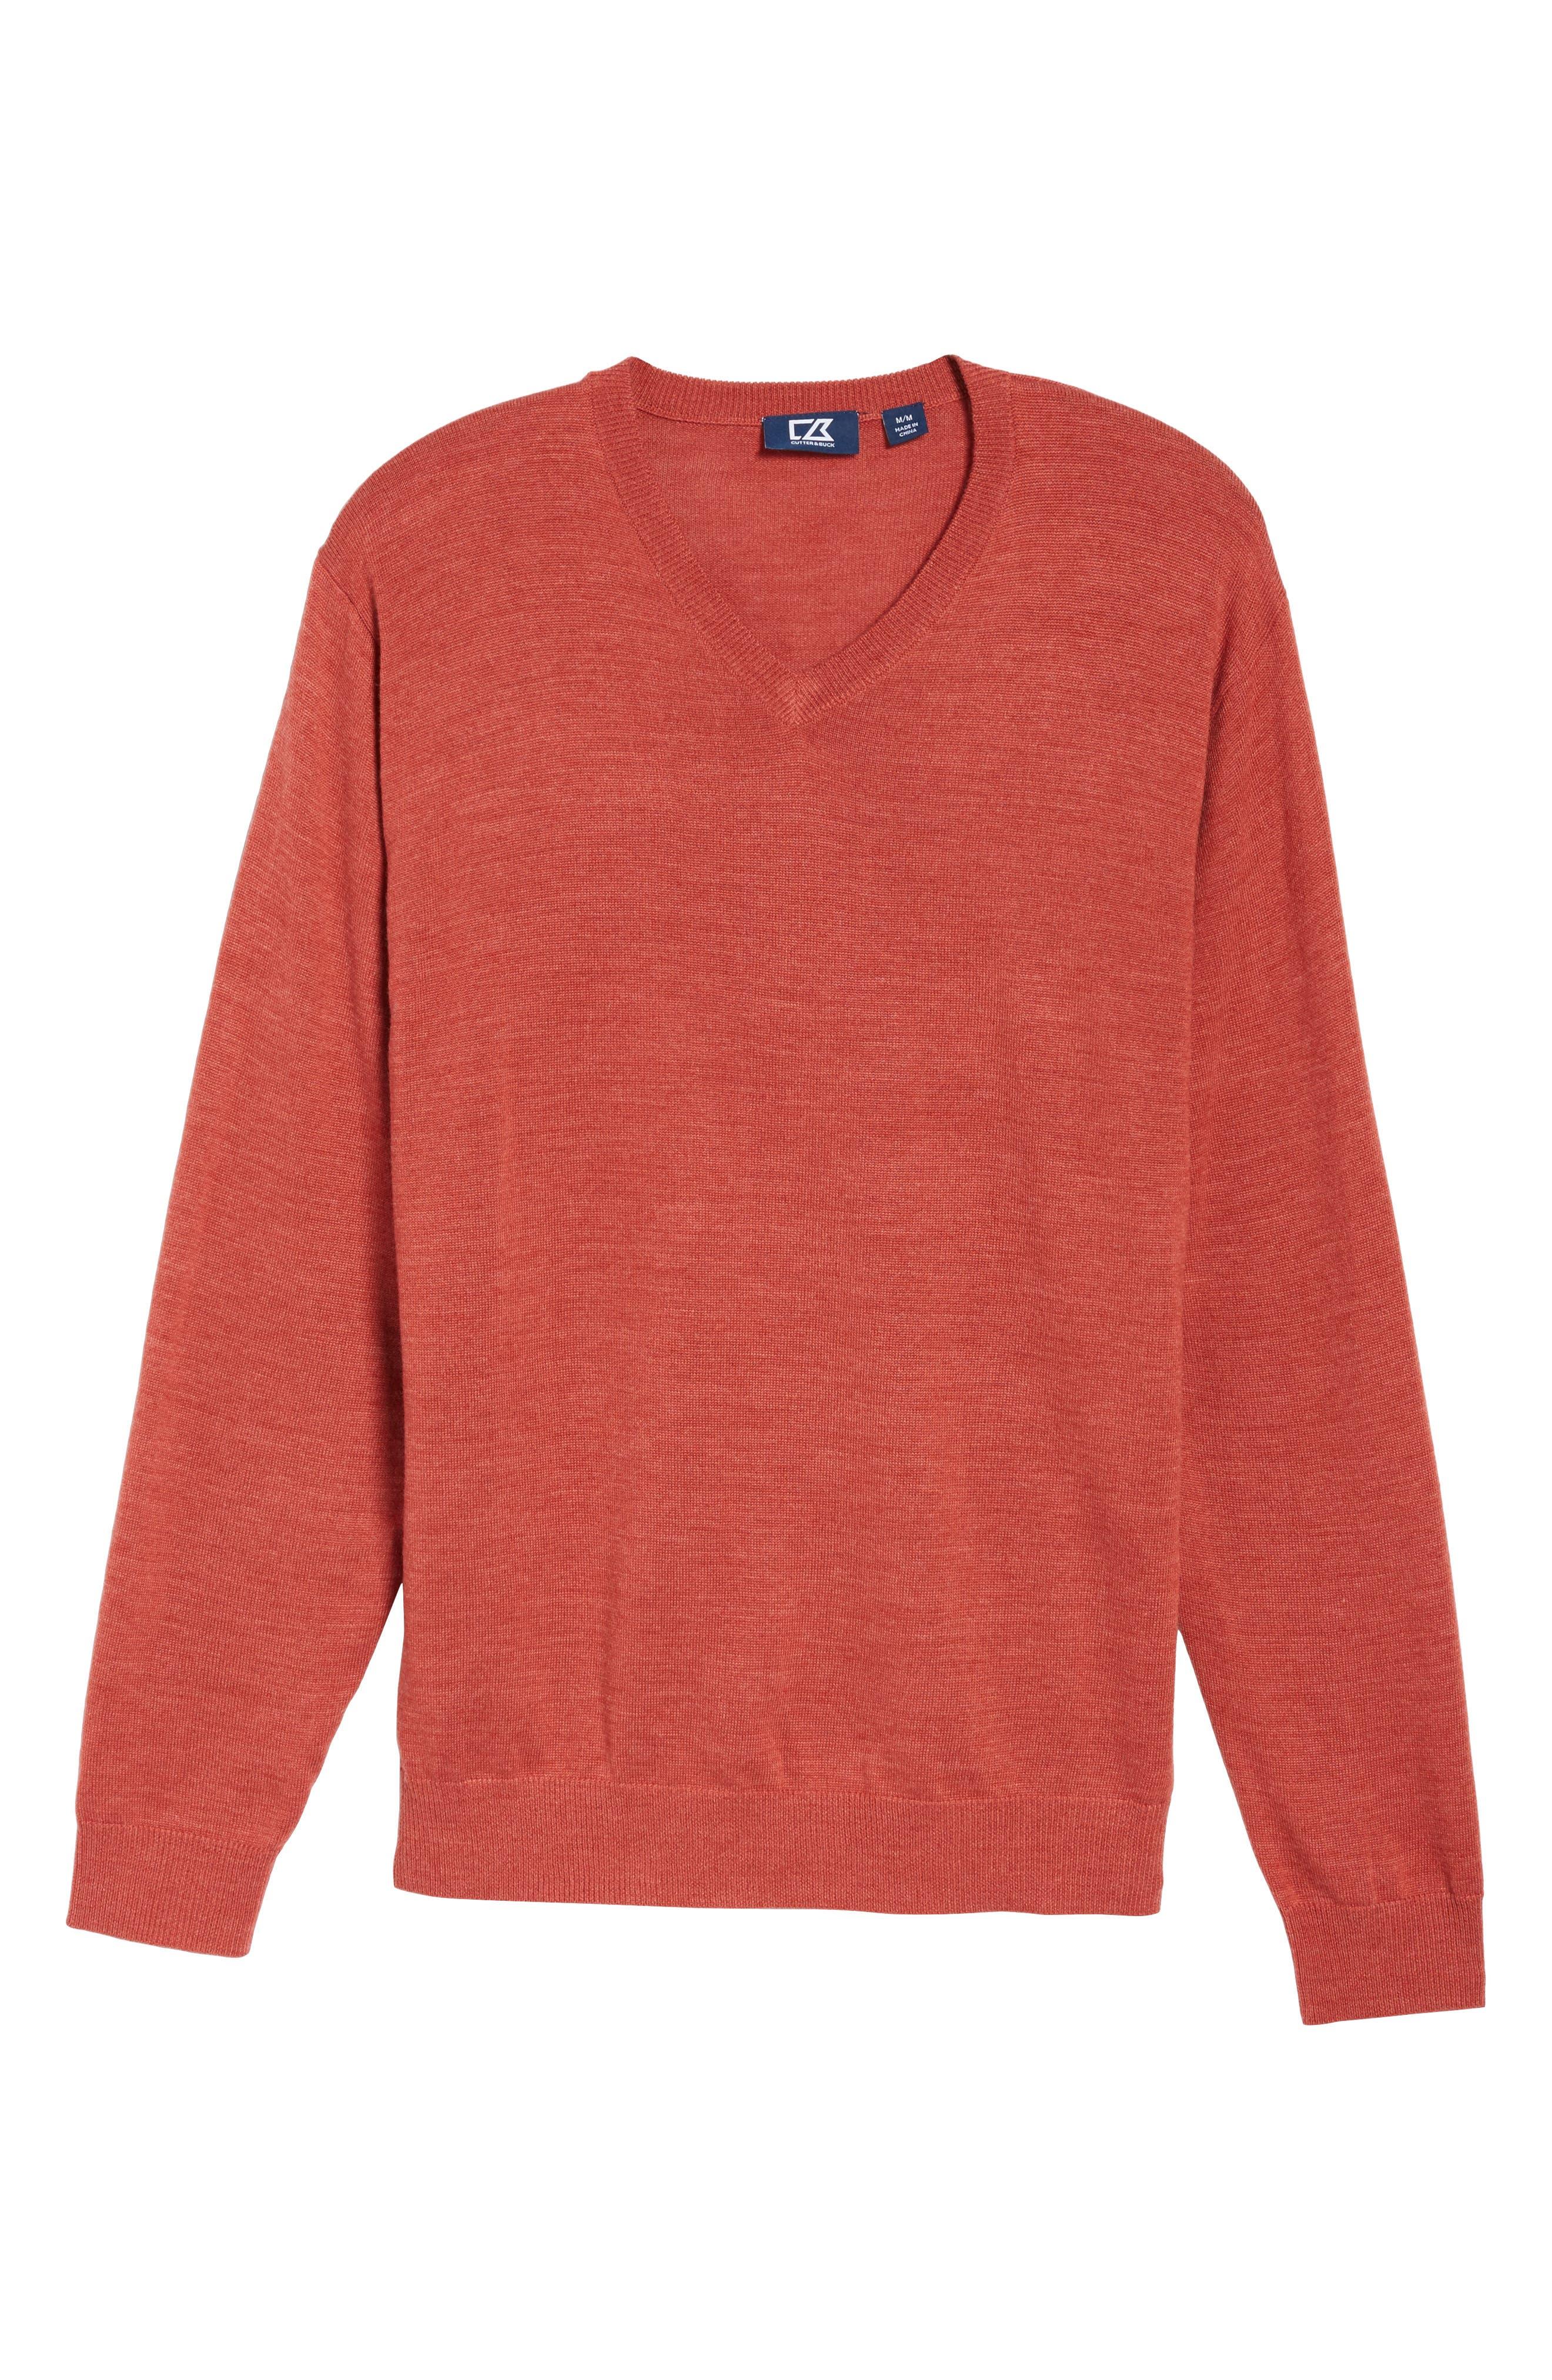 Alternate Image 6  - Cutter & Buck 'Douglas' Merino Wool Blend V-Neck Sweater (Online Only)